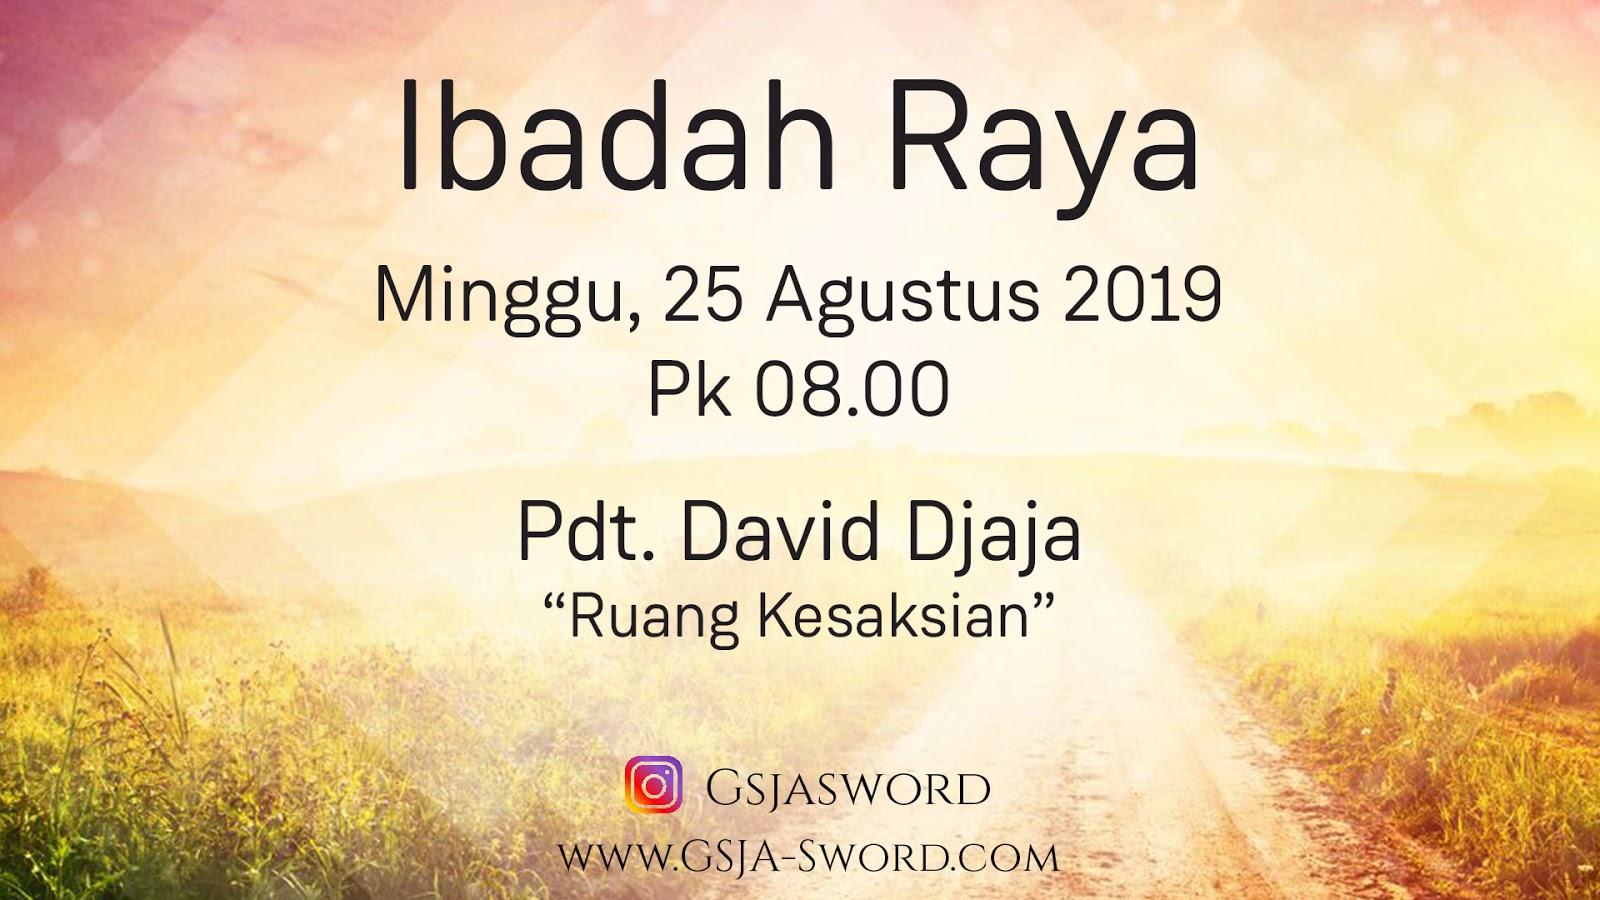 Ibadah Raya GSJA Sword 25 Agustus 2019 Jam 08.00 WIB